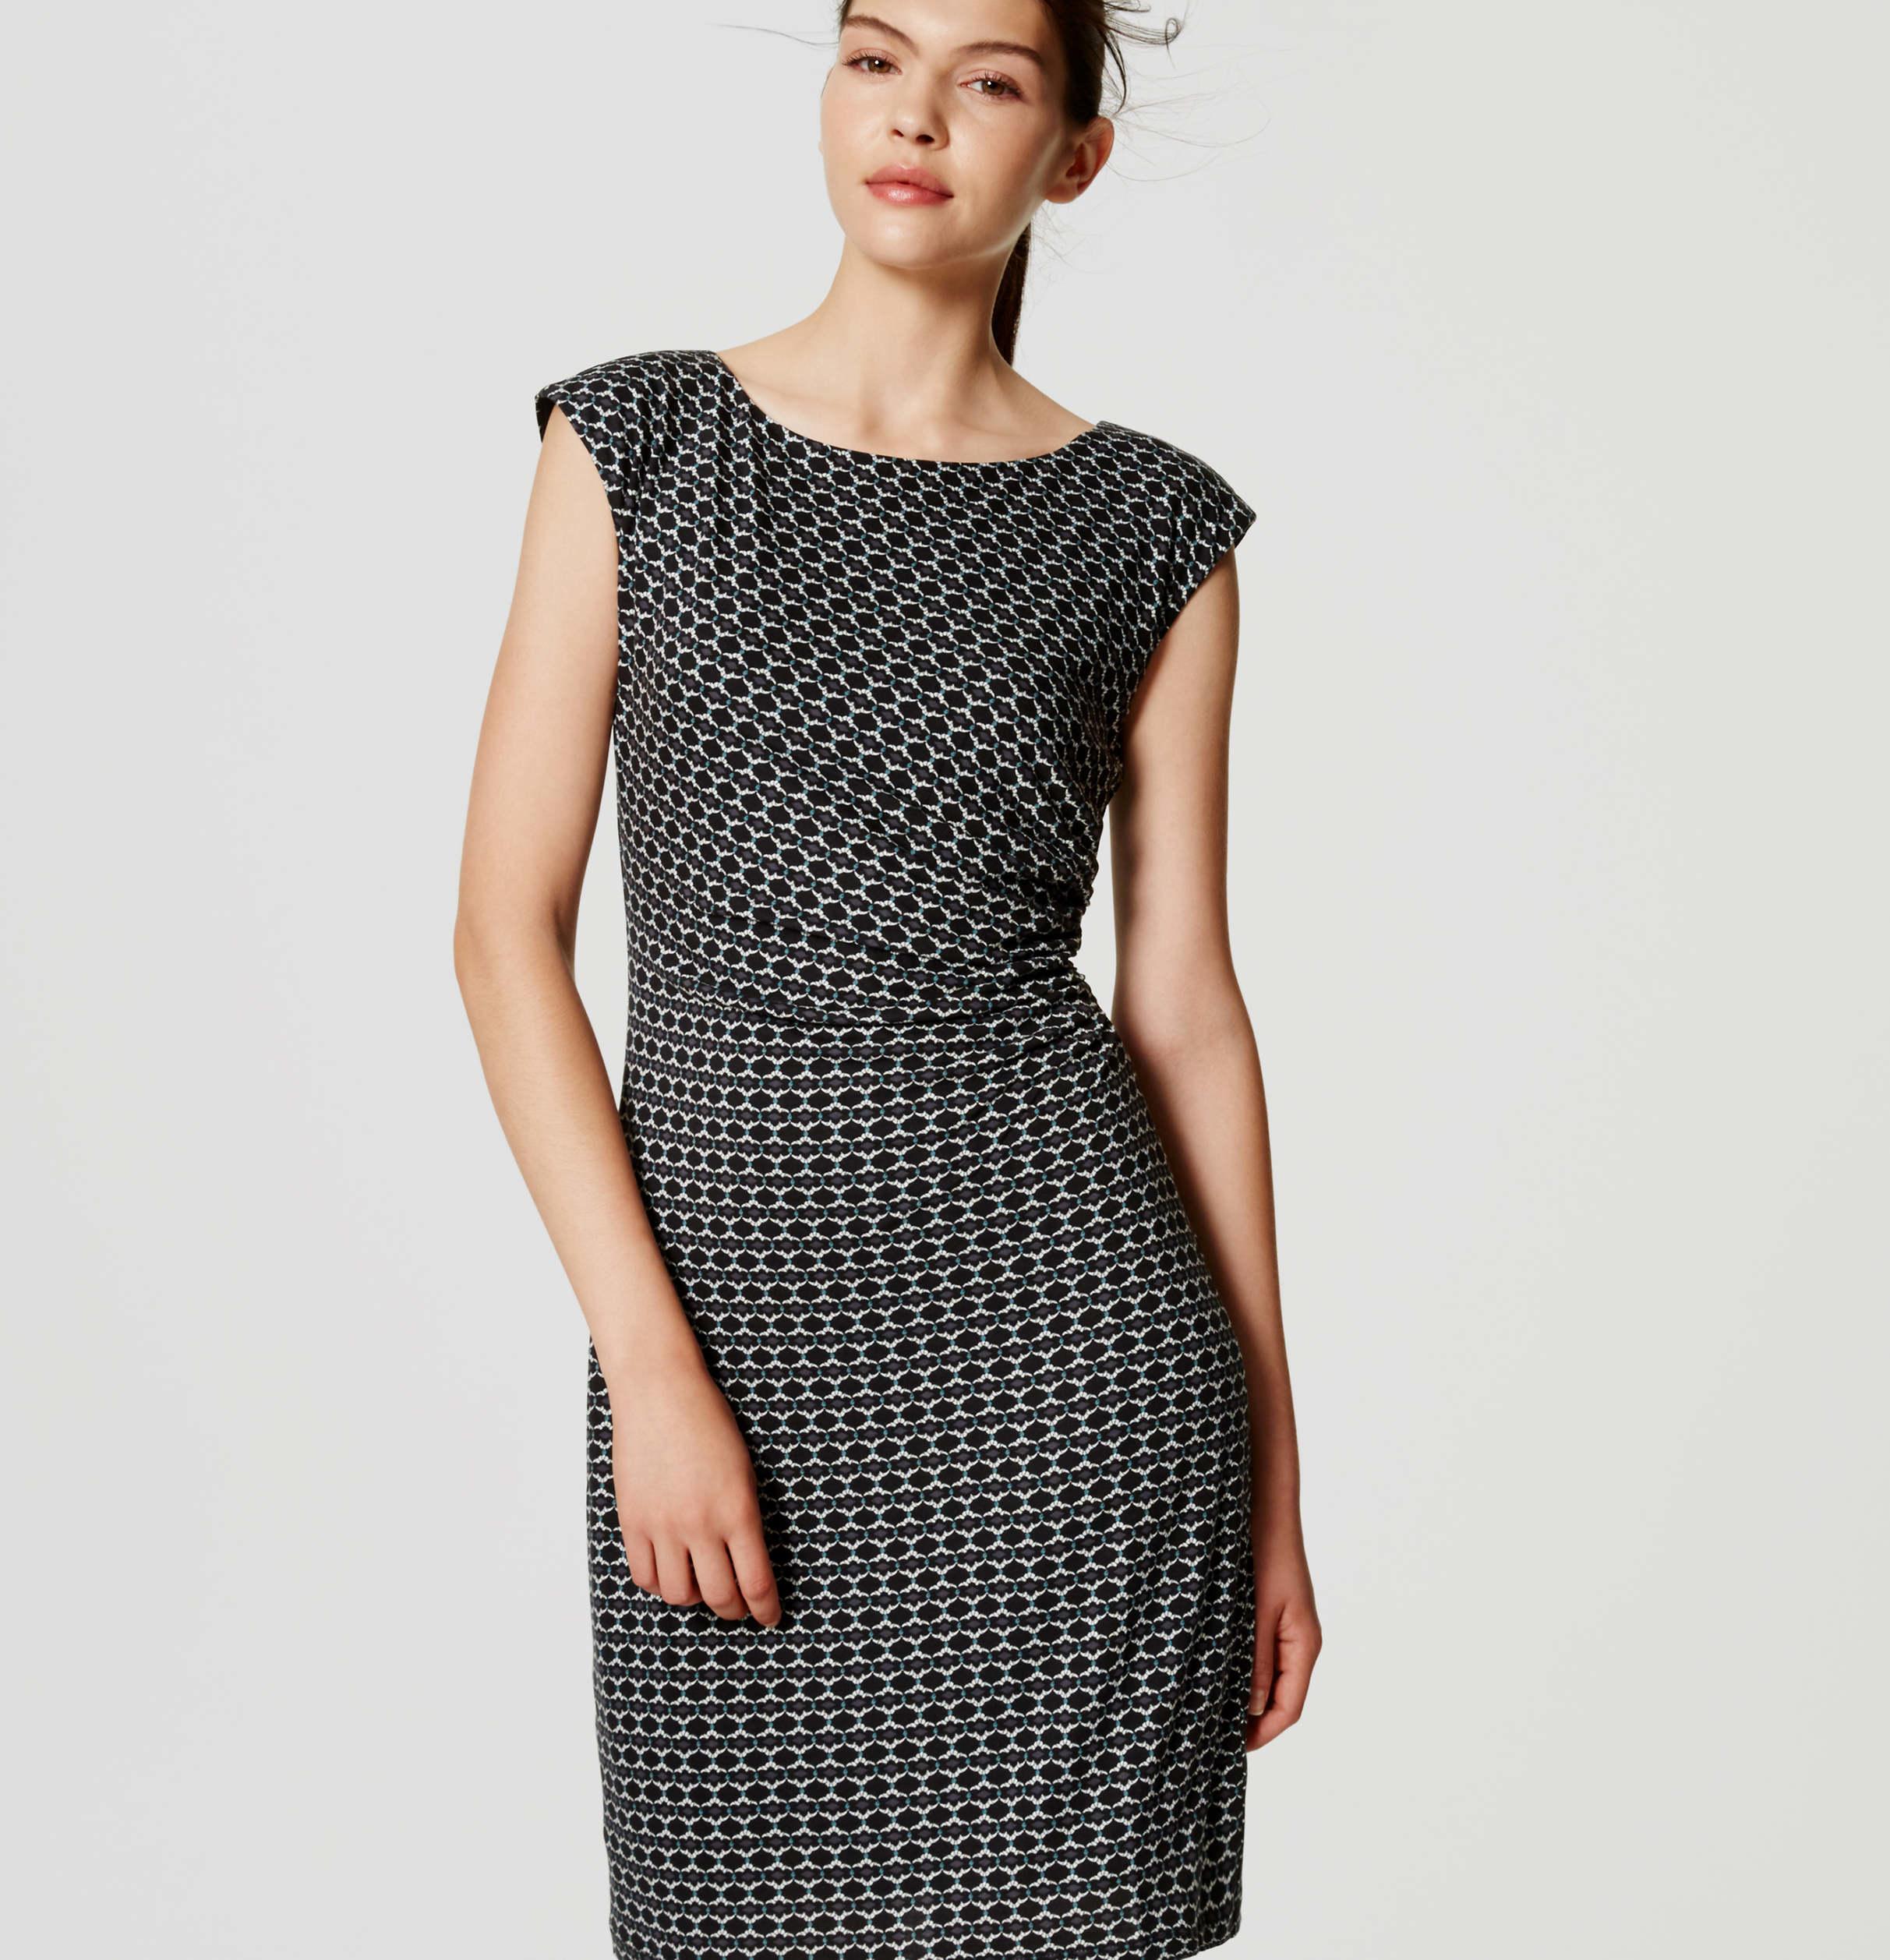 Lyst - Loft Petite Mosaic Side Shirred Dress in Black